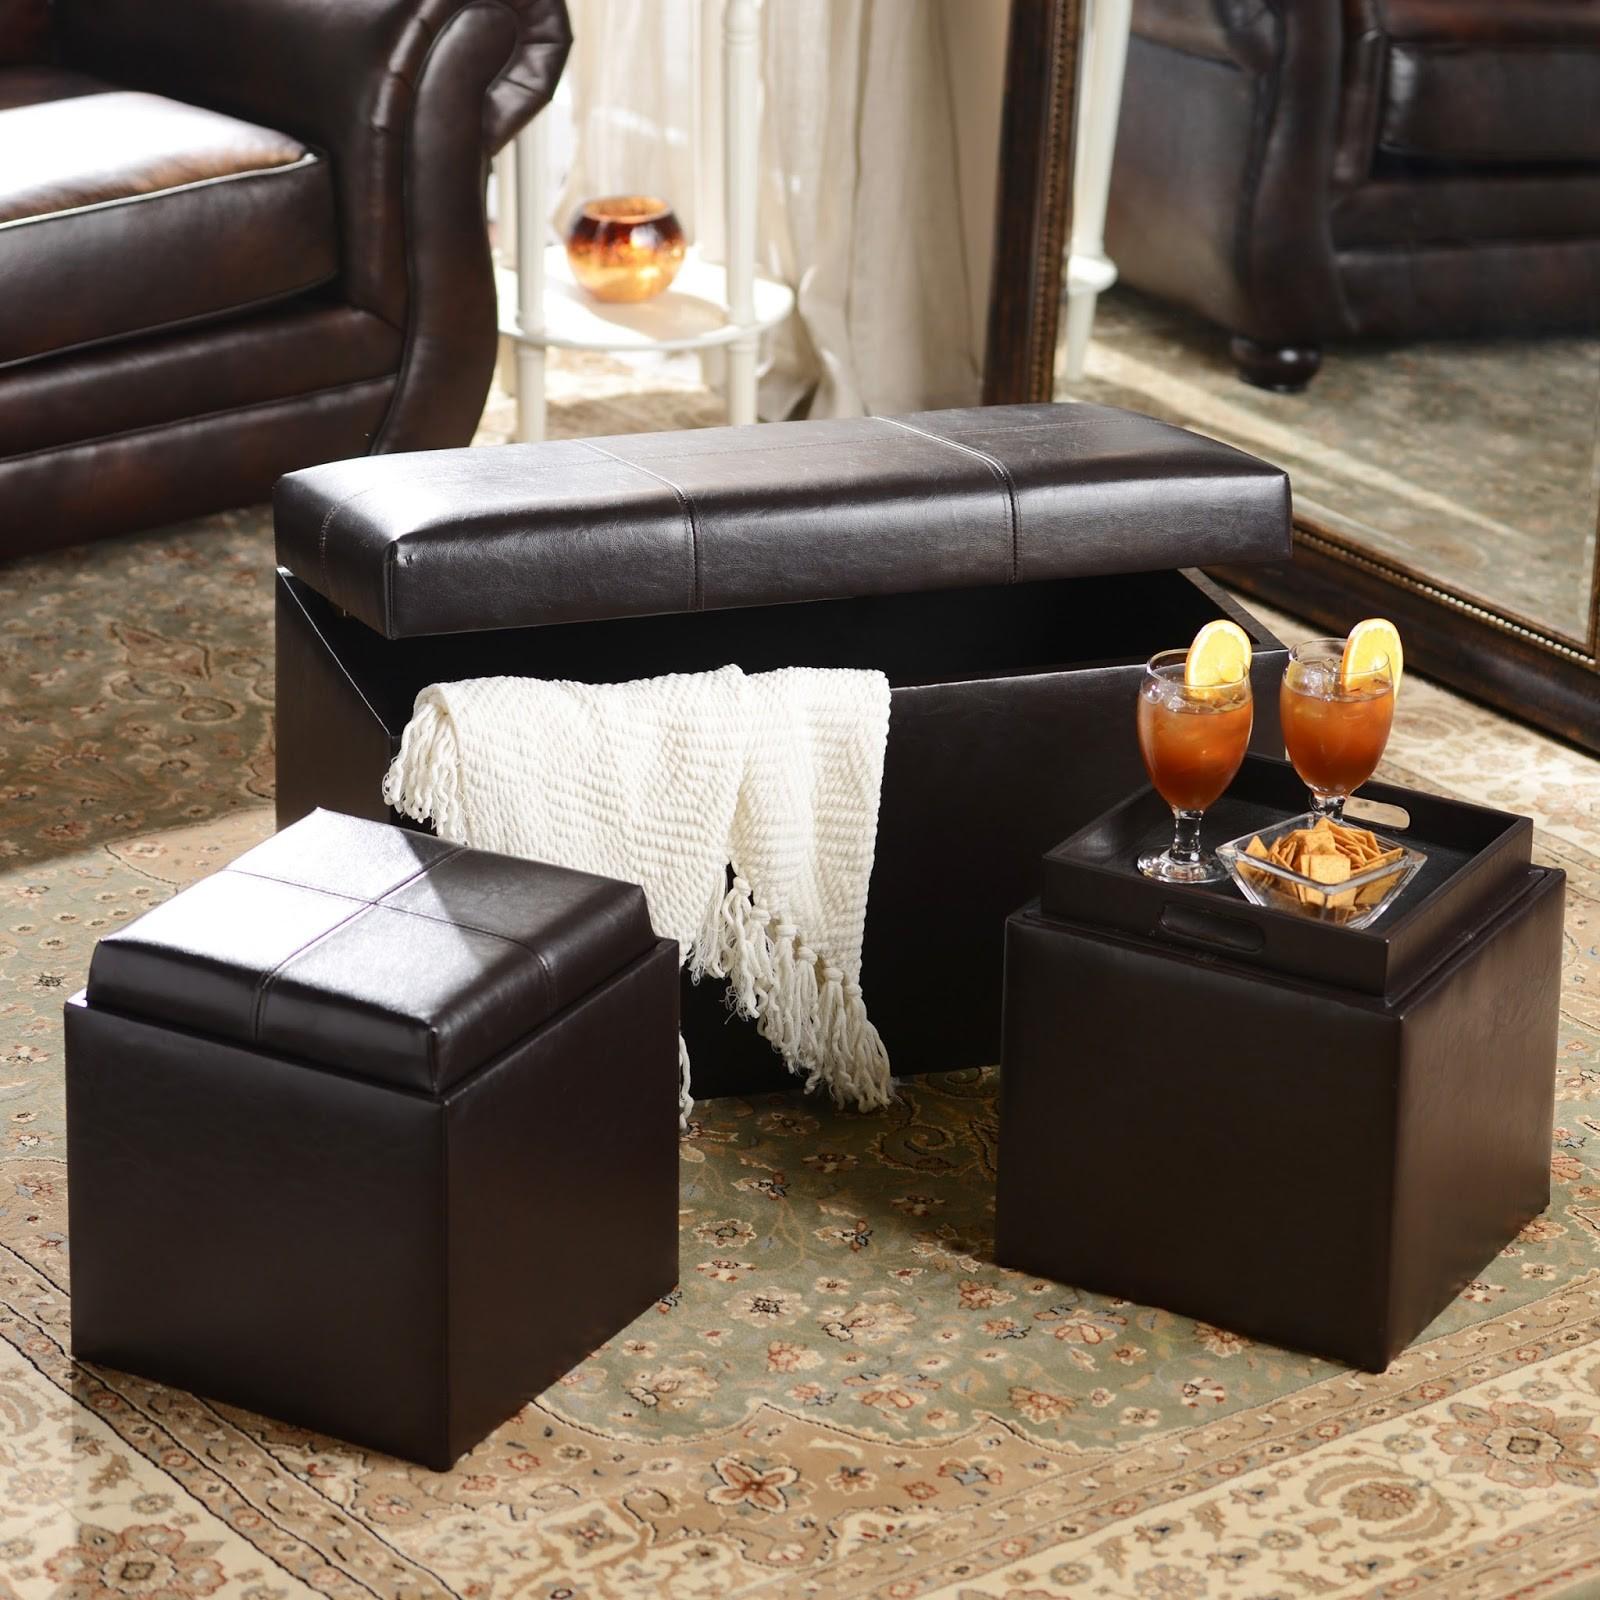 2 Furniture ideas Kirkland home decor by Simphome 5